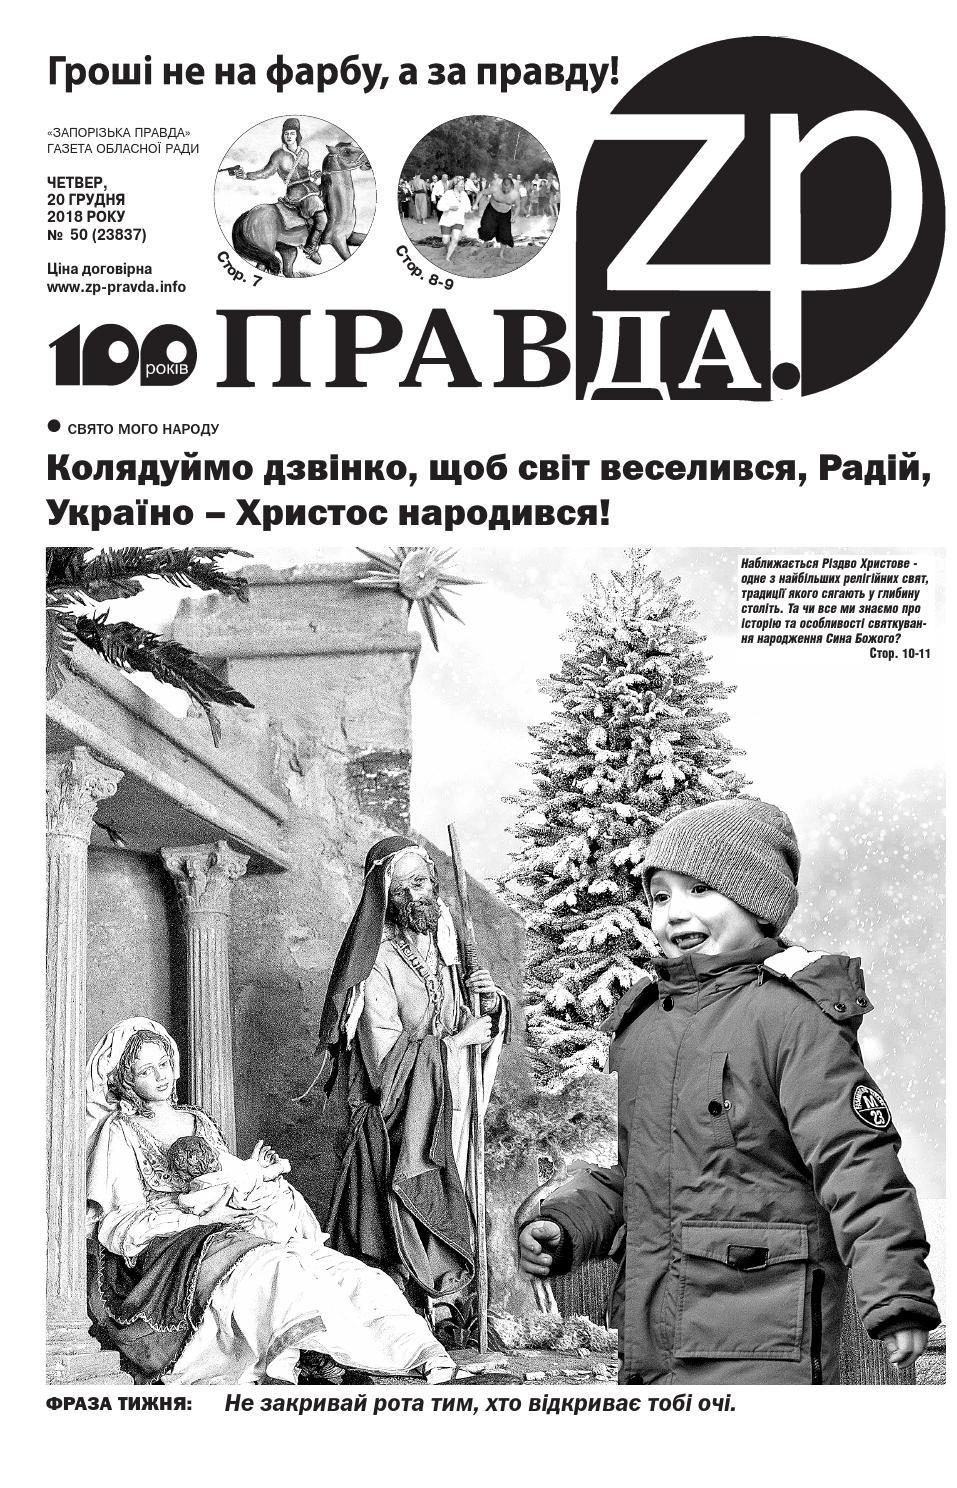 20.12.18 by Запорізька правда - issuu b3efe6f621f91